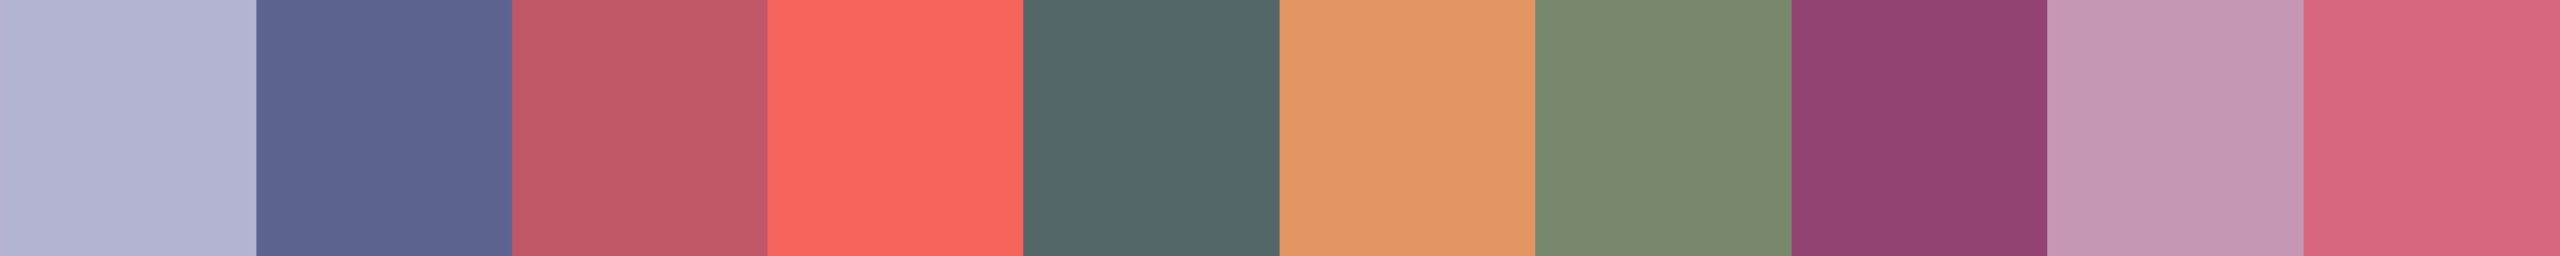 633 Cemetrita Color Palette